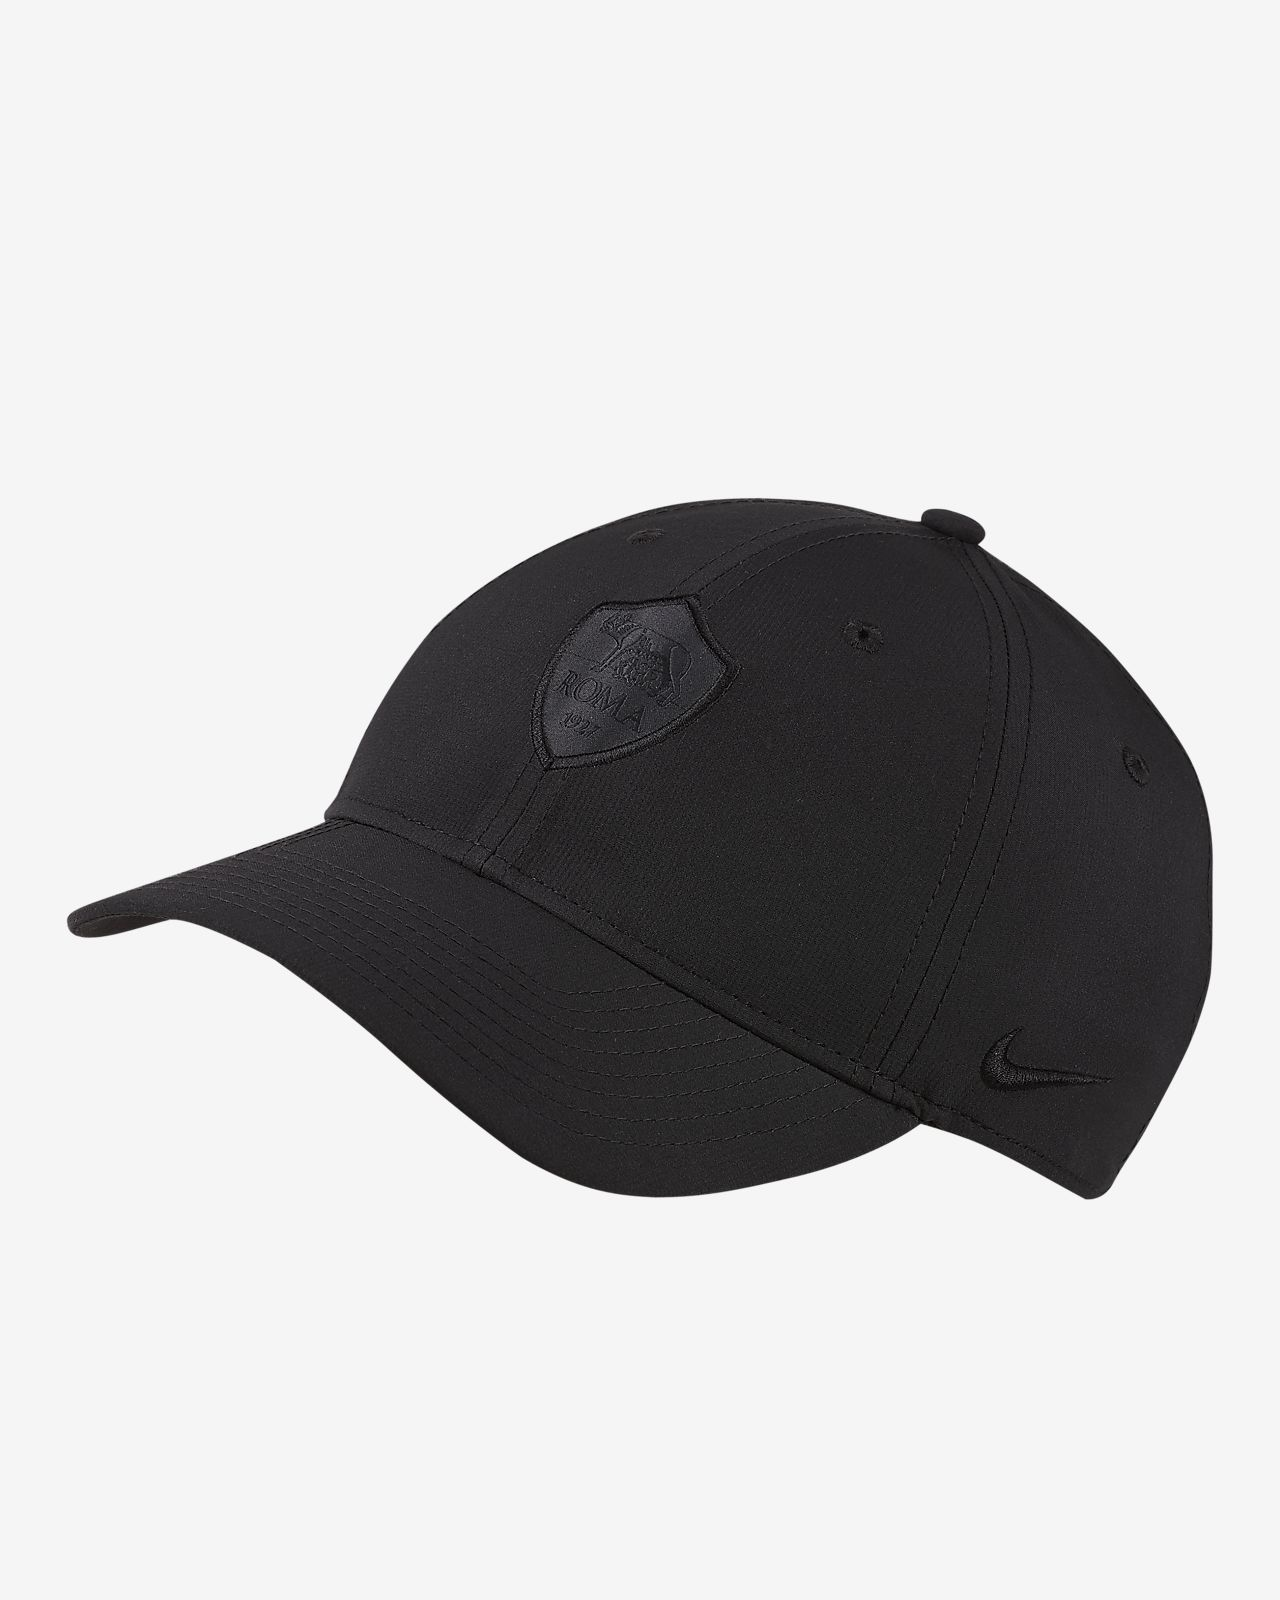 A.S. Roma Legacy91 Ayarlanabilir Şapka